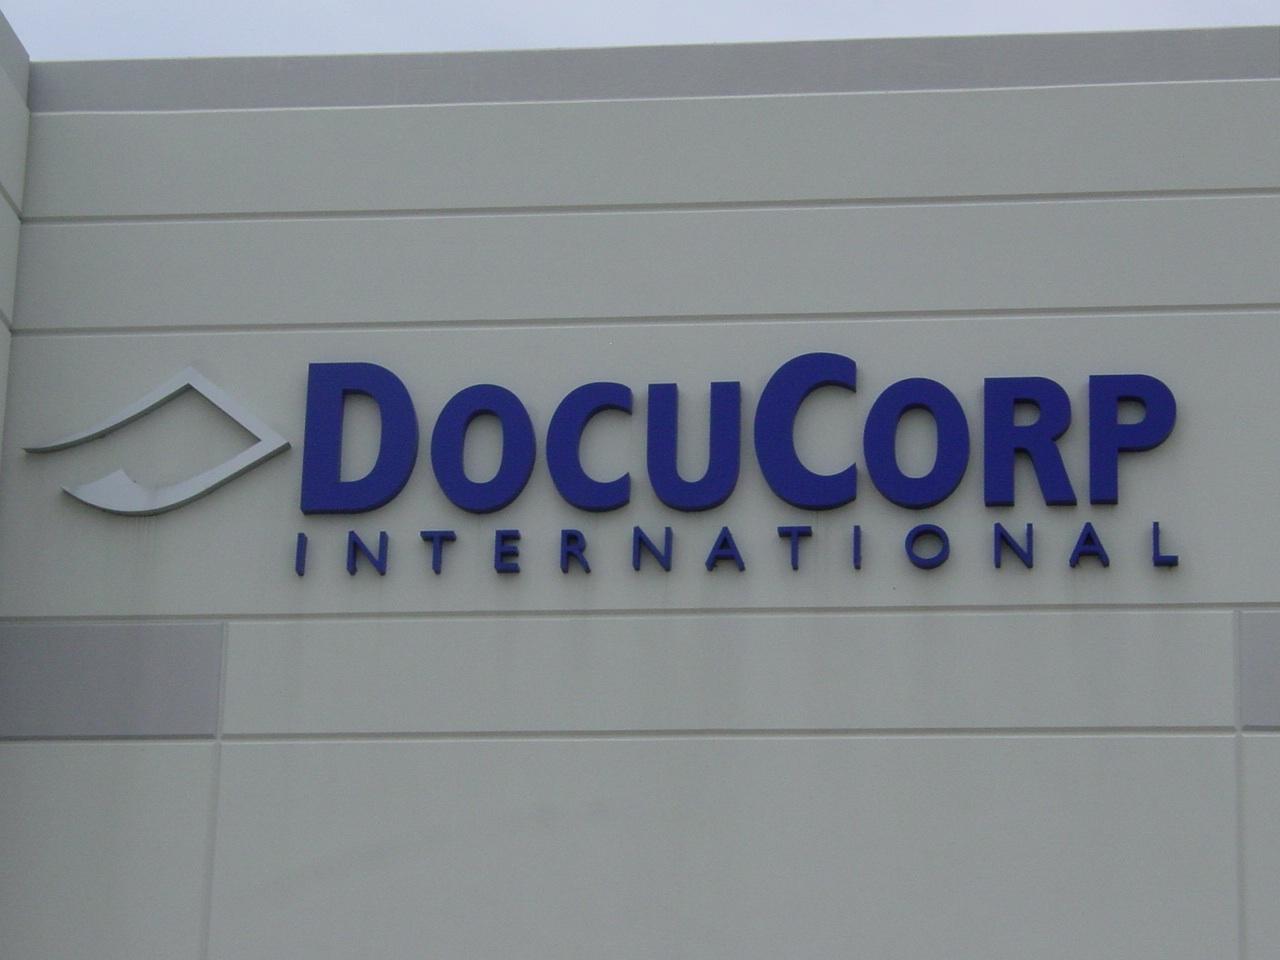 docucorp reverse channel letters non-lit